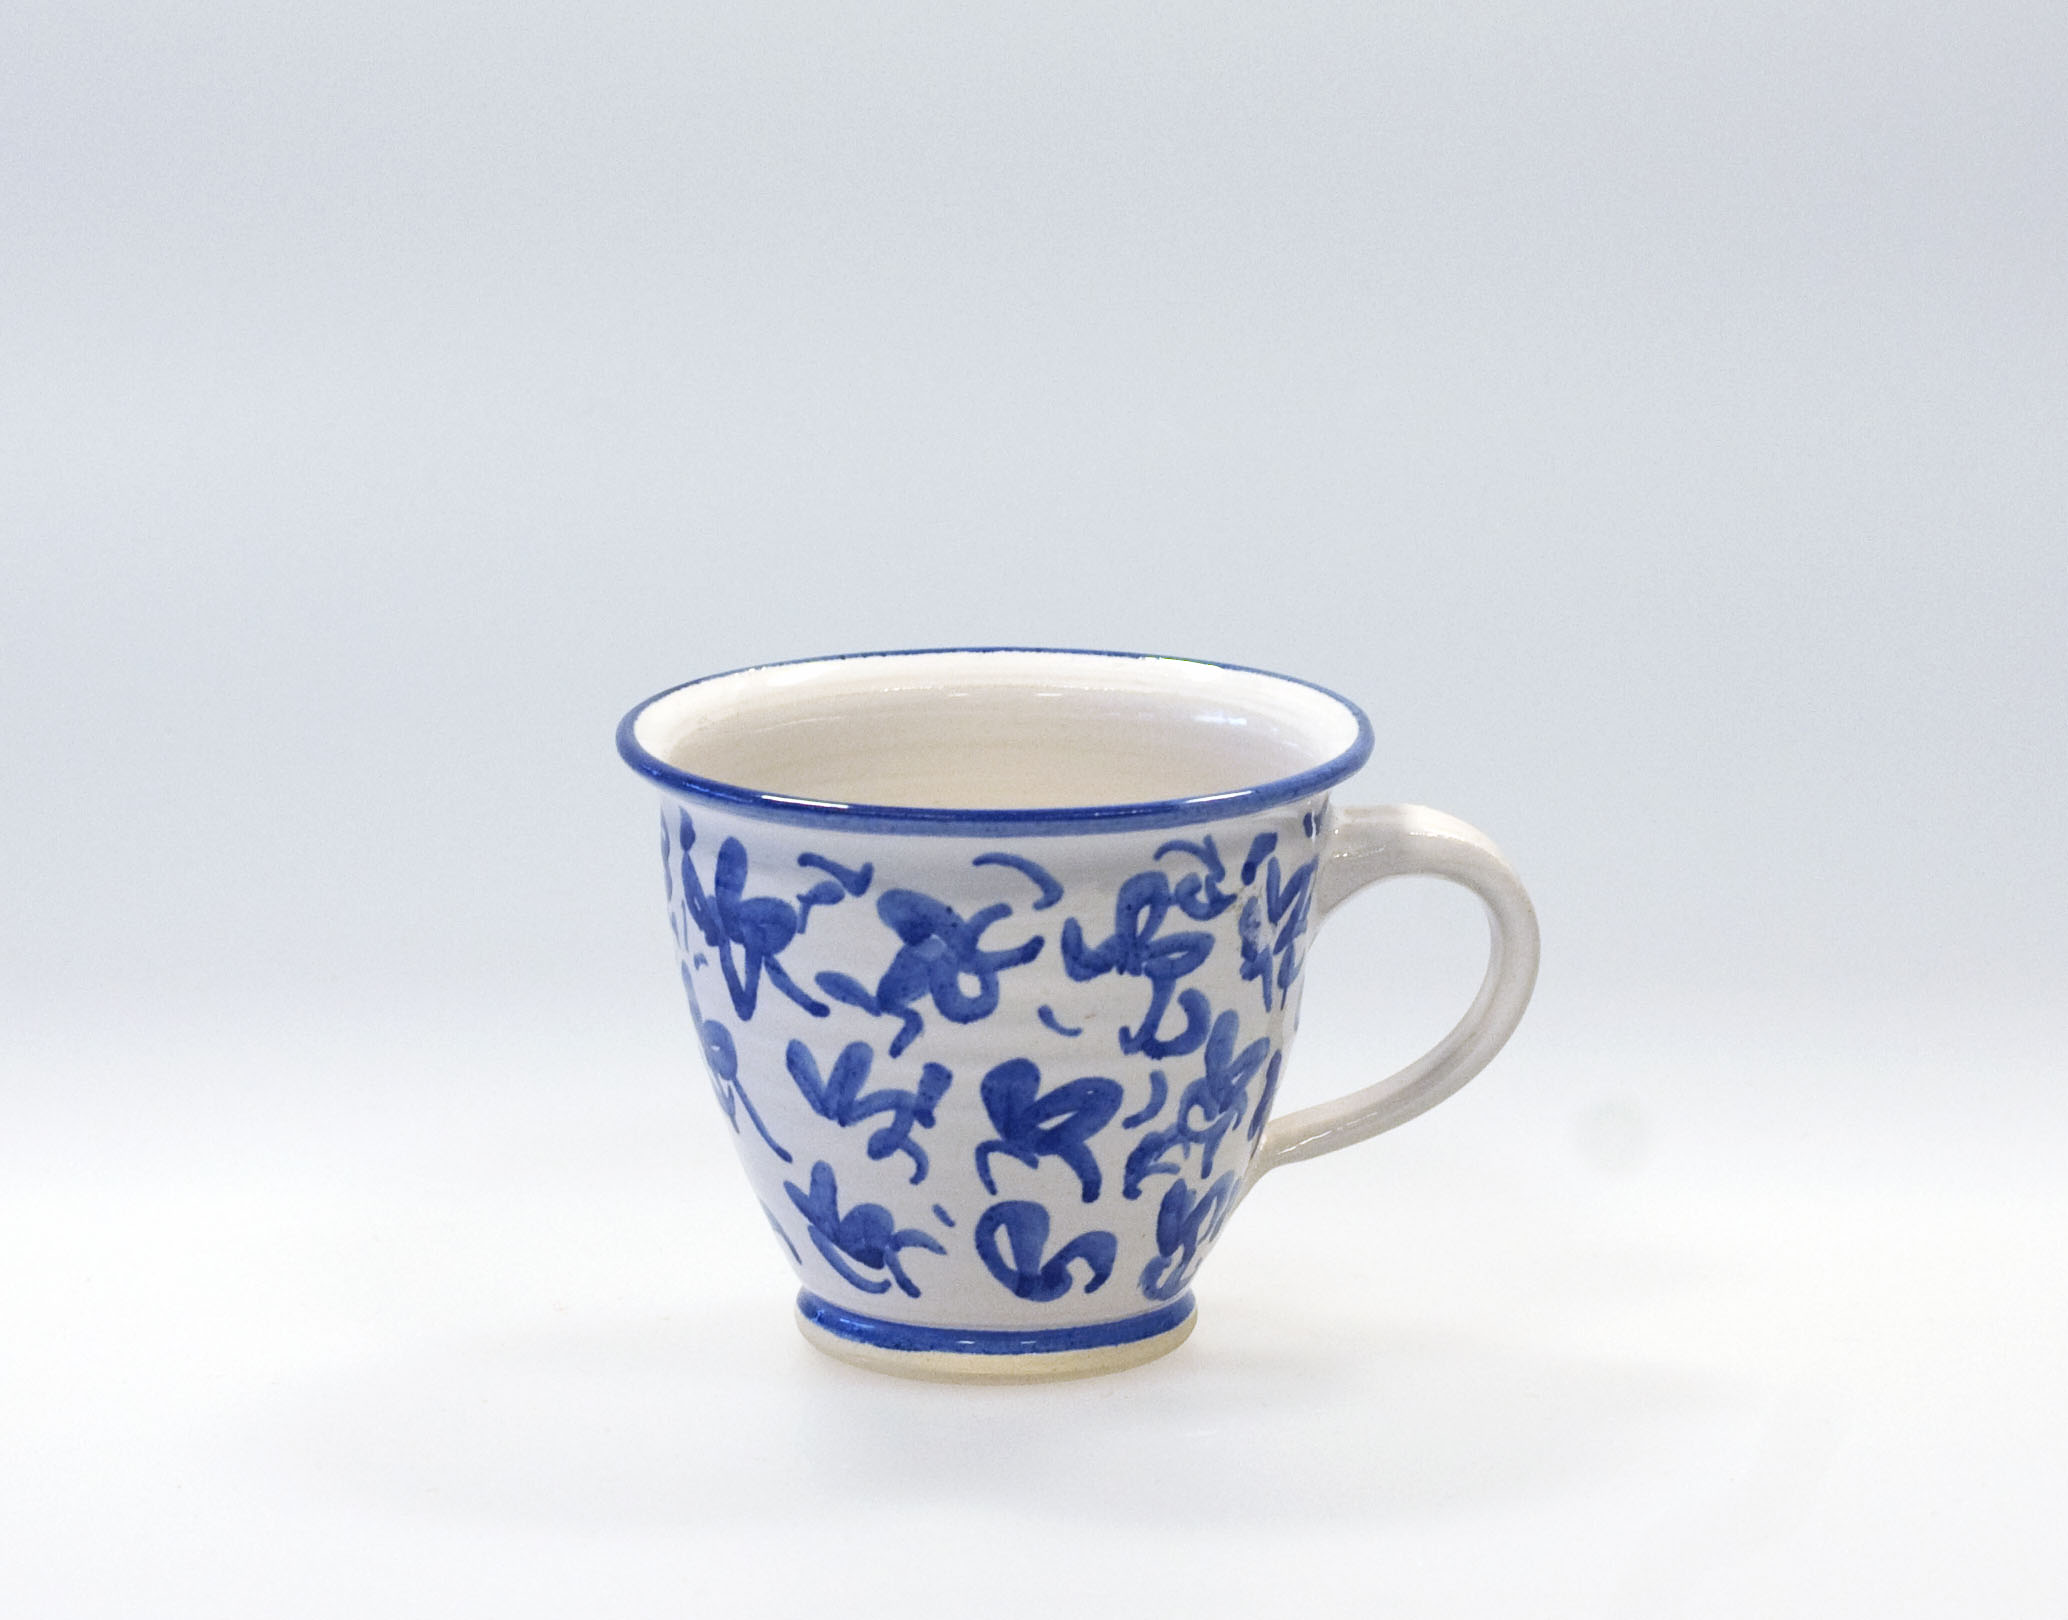 Virrvarr kopp